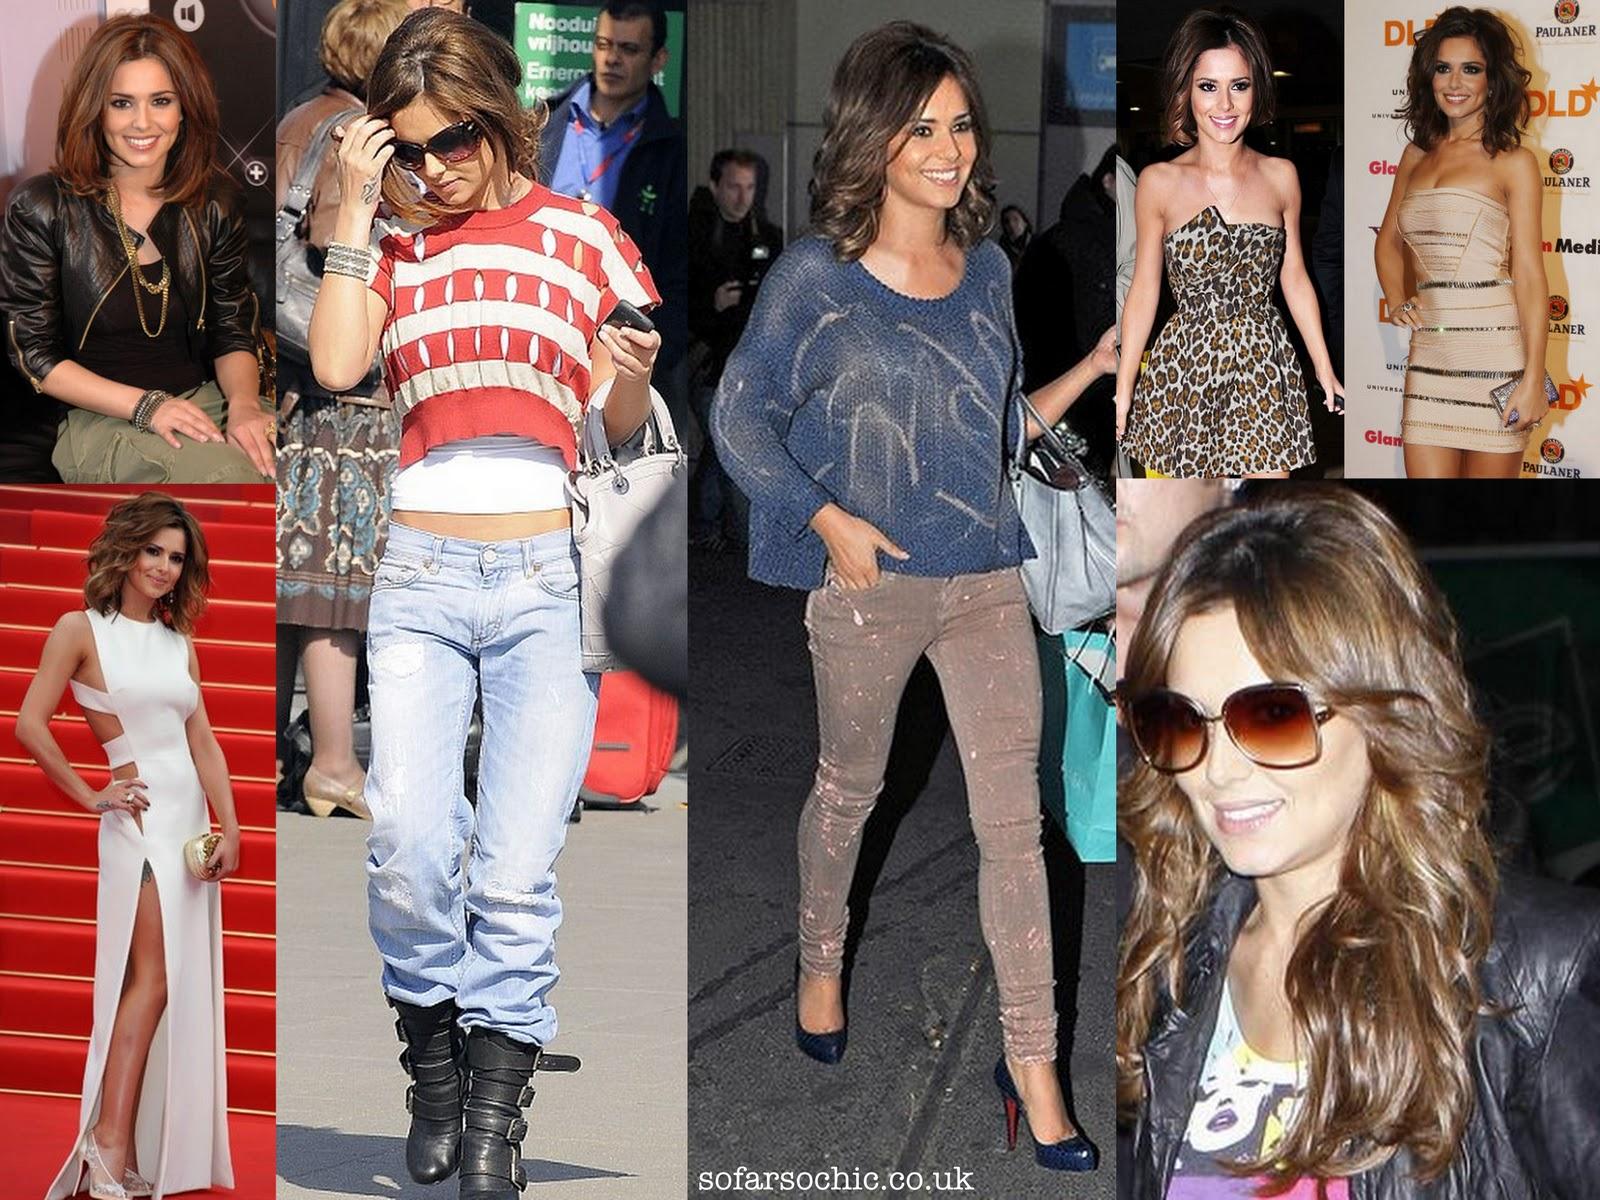 http://4.bp.blogspot.com/_9dl_QcOKSfg/TO-bnf5yOgI/AAAAAAAABNI/NoHKK9WUNWQ/s1600/Cheryl+Cole_short+hair.jpg